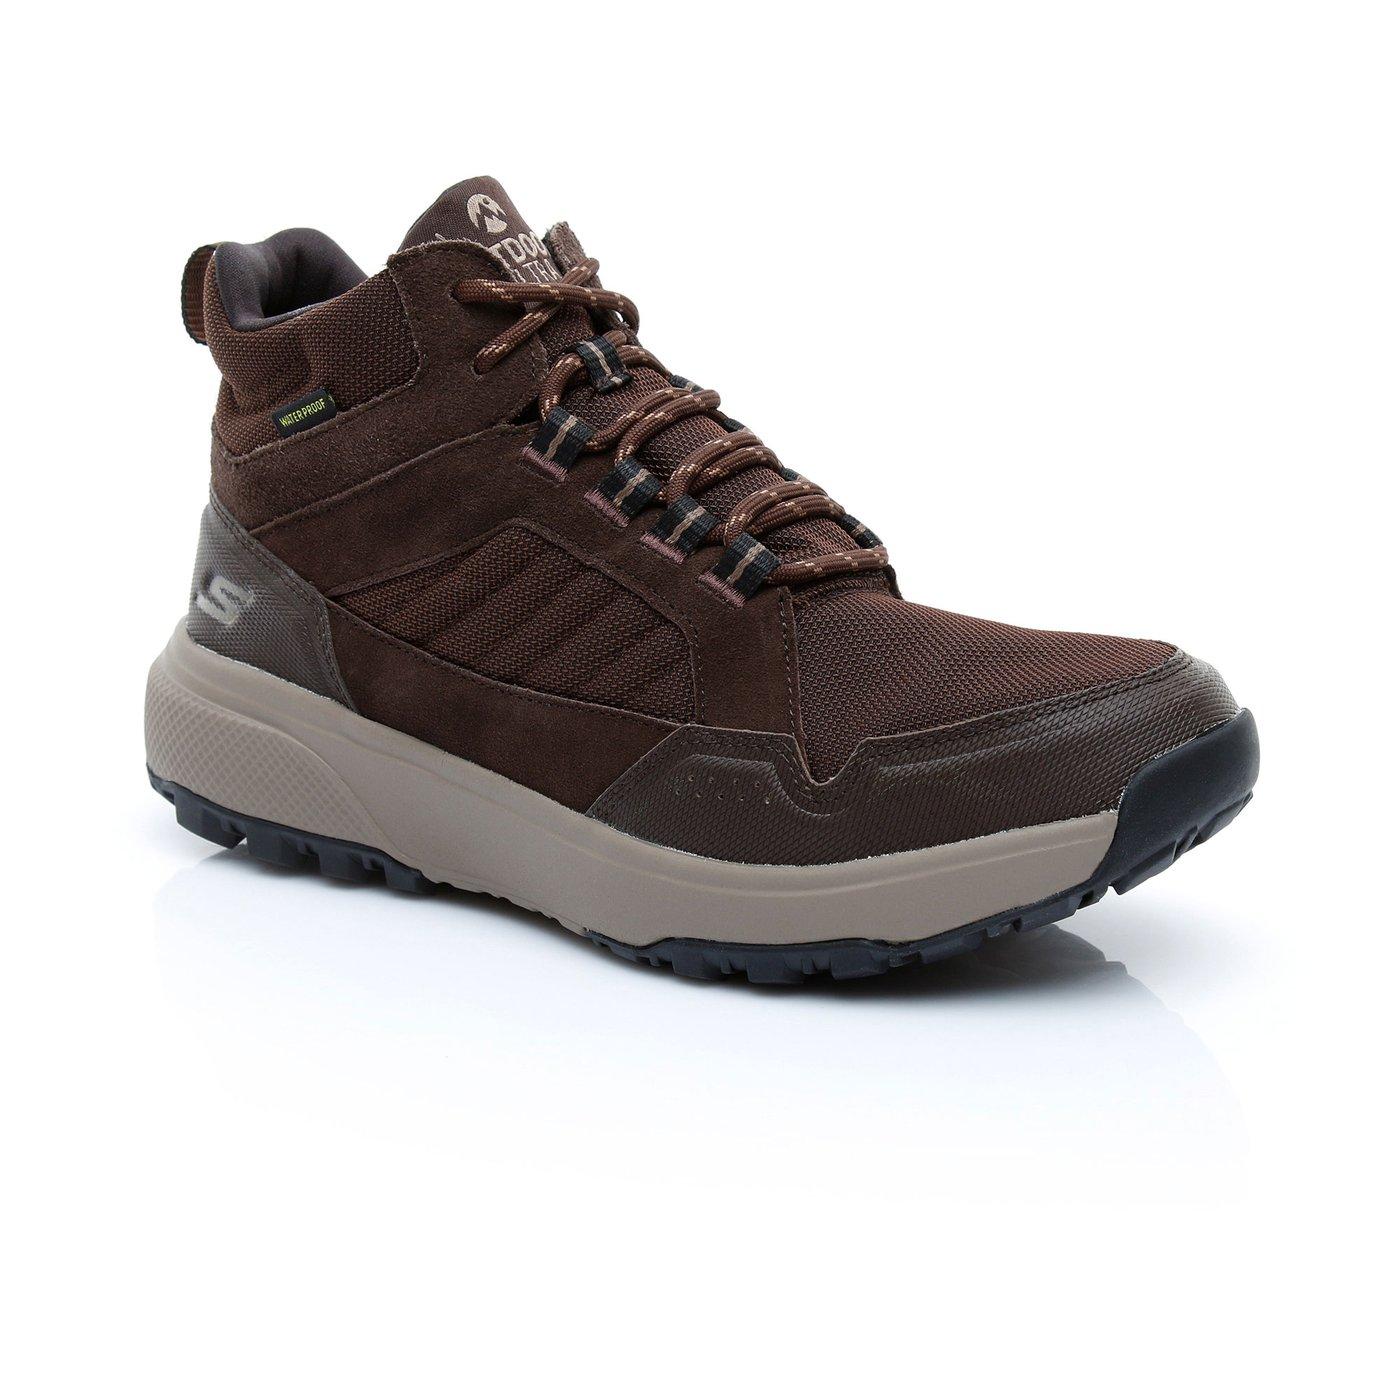 Skechers Outdoor Ultra Erkek Kahverengi Sneaker